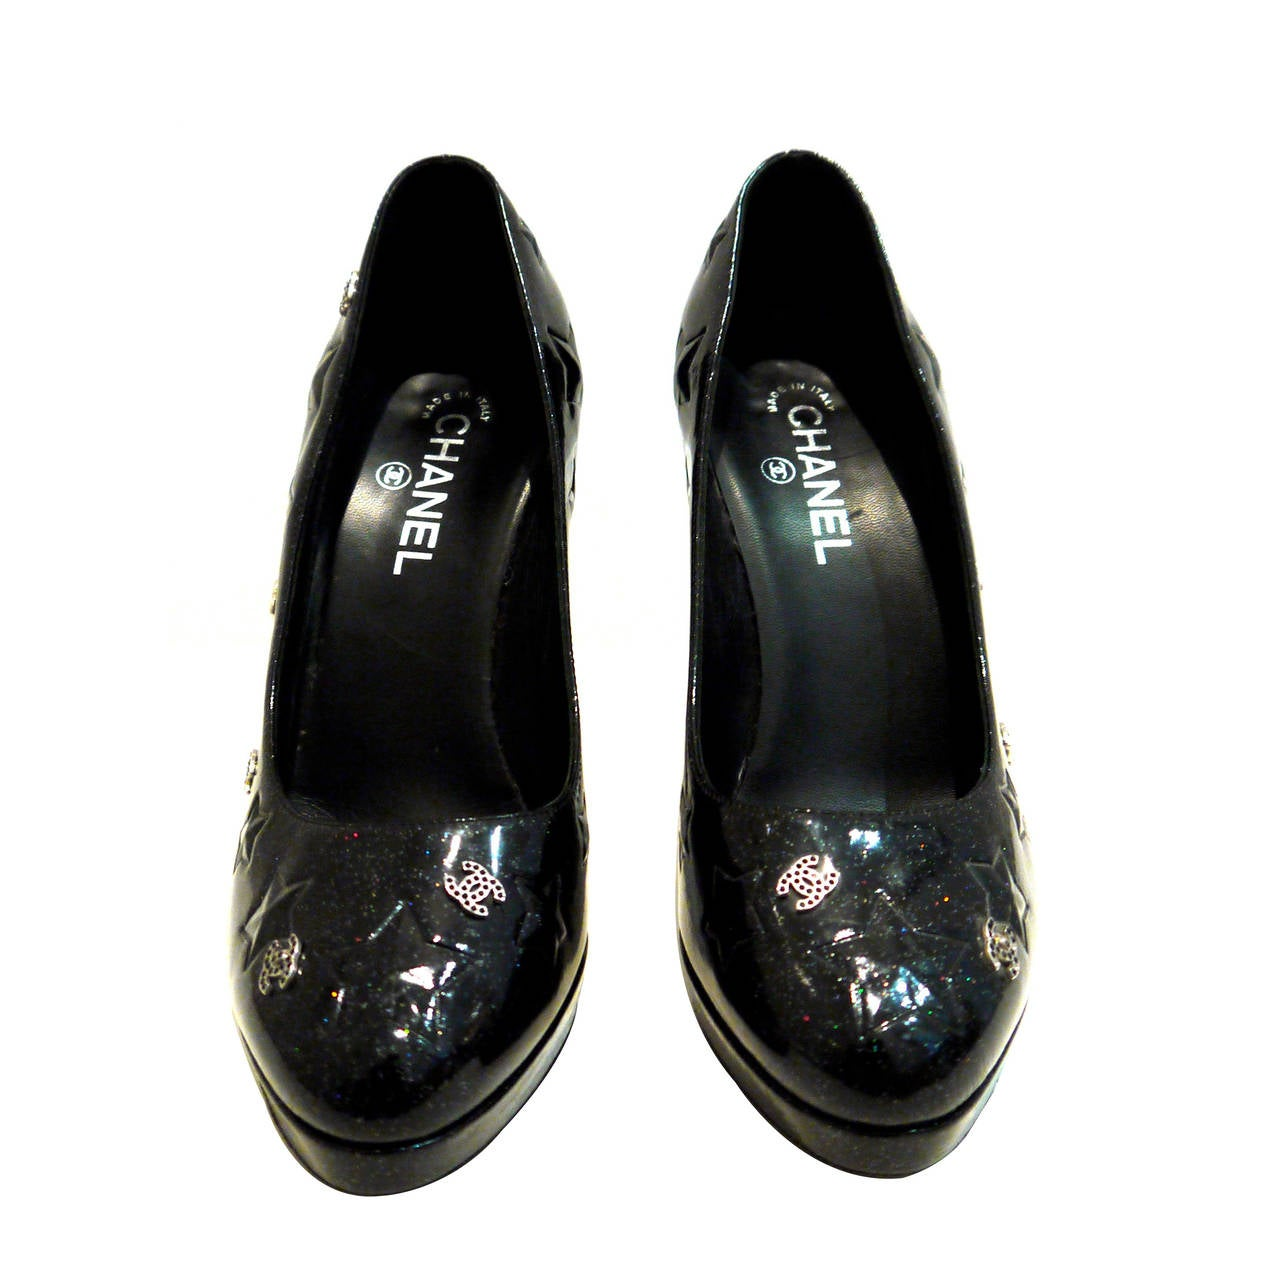 Chanel Black Patent Platform Shoes Heel Size 41 At 1stdibs